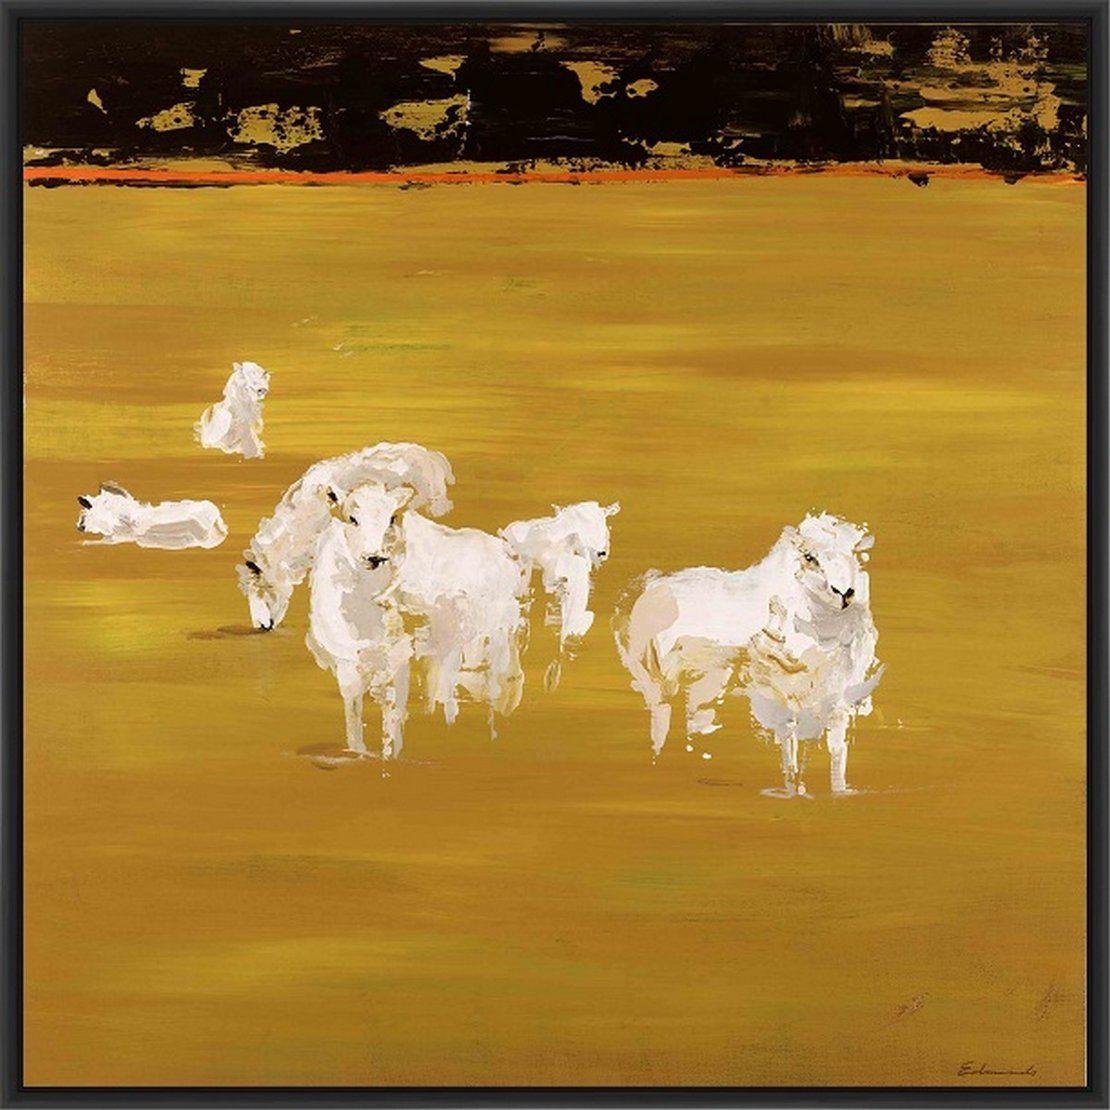 Yellow Patch\' Framed Print on Canvas | Art | Pinterest